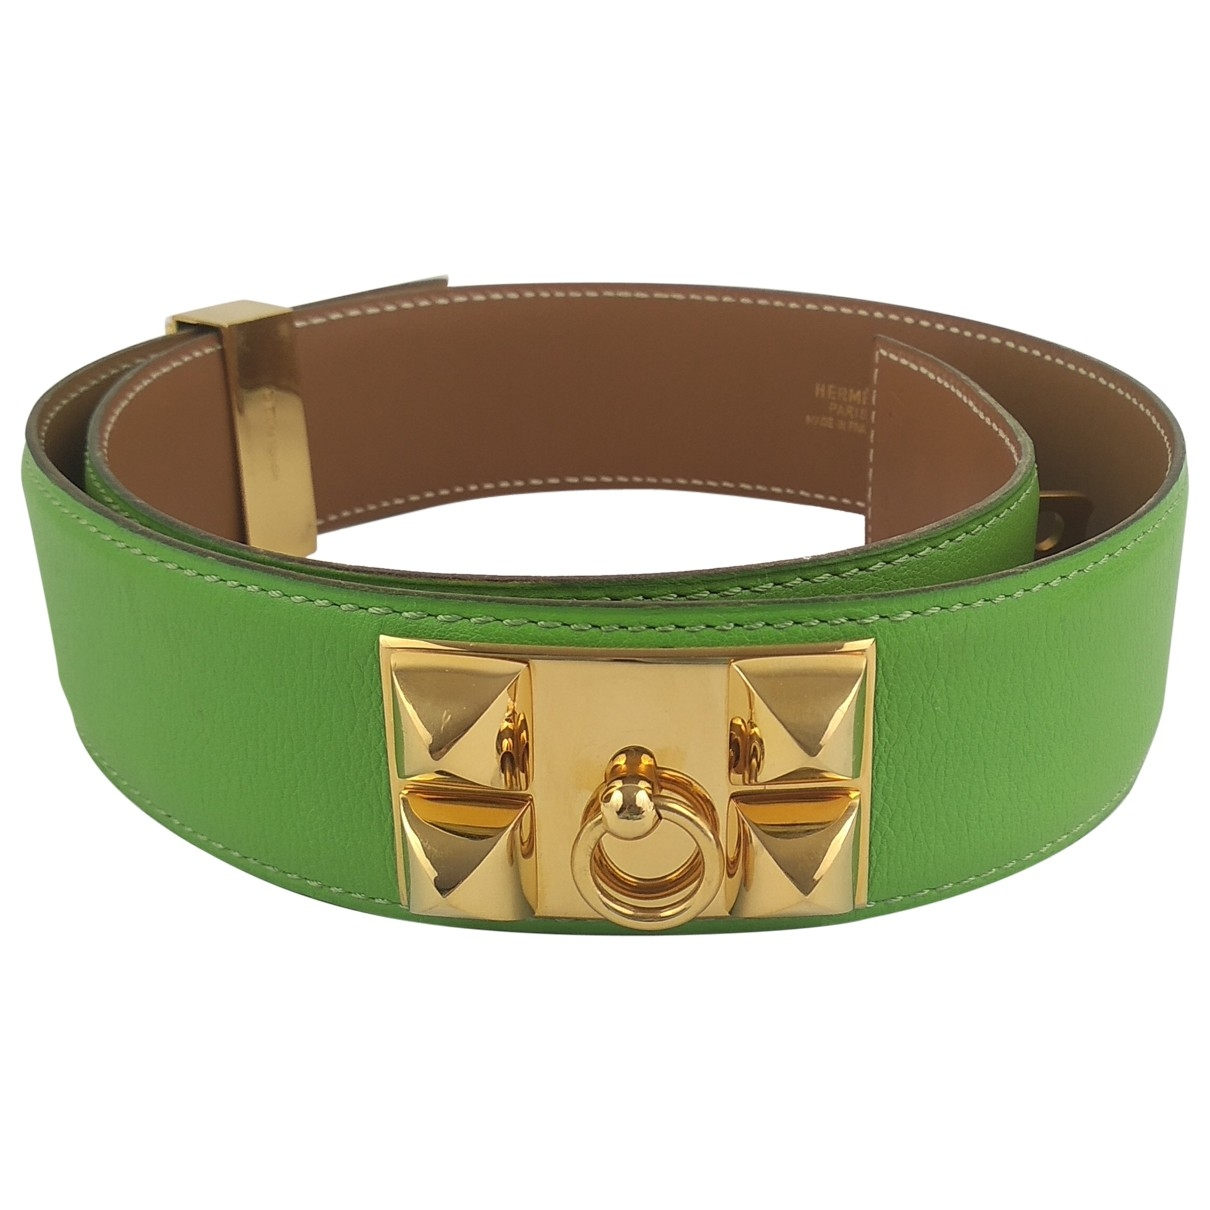 Hermes Collier de chien Guertel in  Gruen Leder